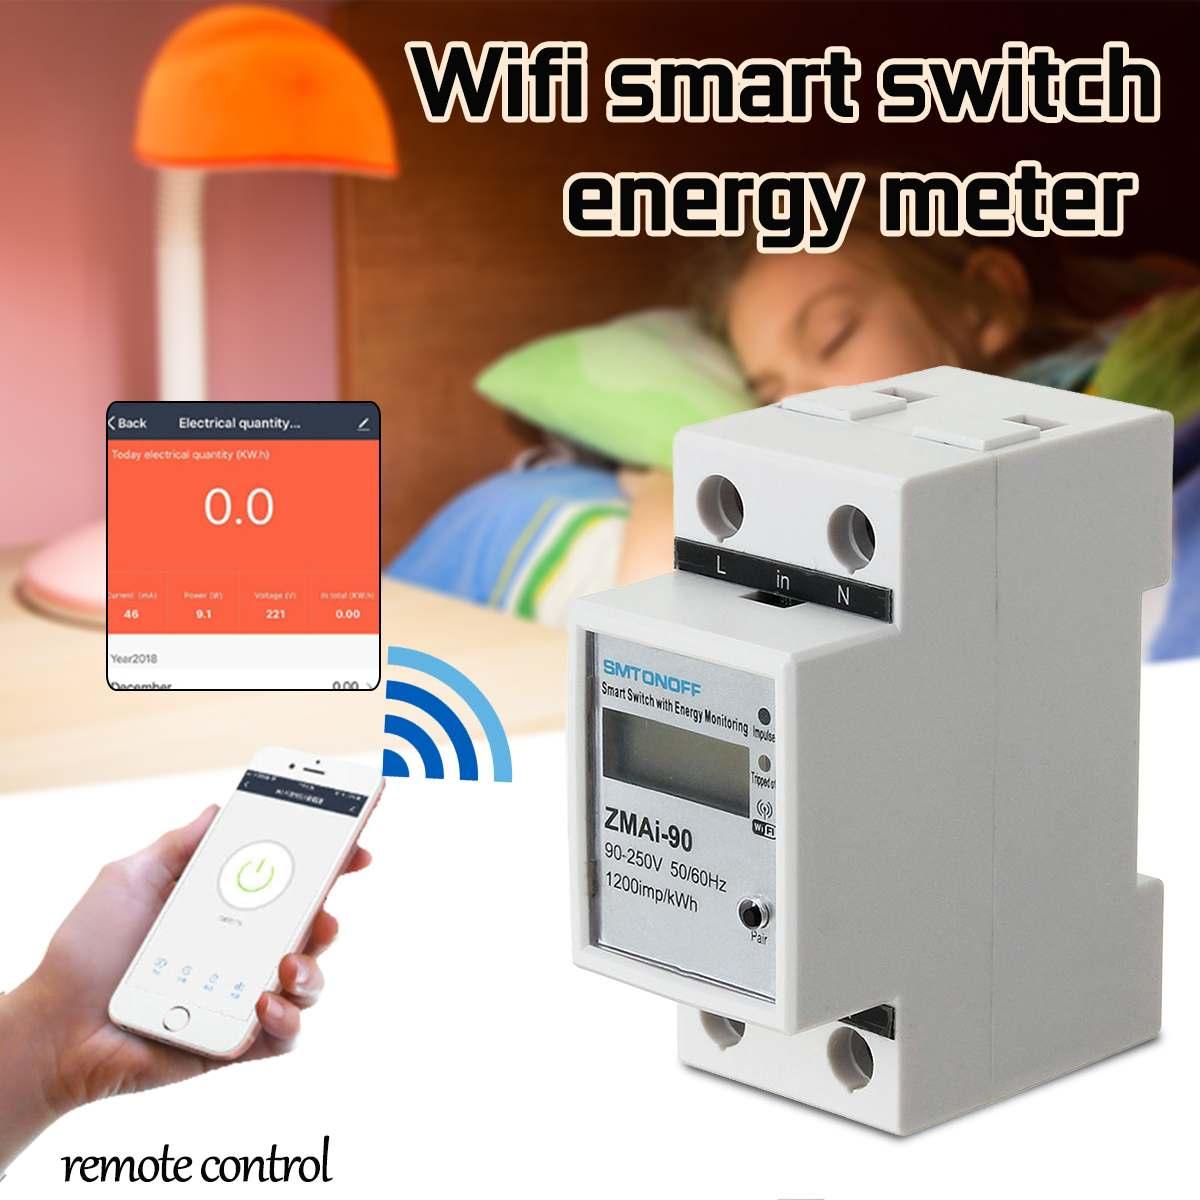 Digital Electric Consumption KWh Rail Smart Energy Meter WiFi Power Meter Watt Remote Switch Control Monitor 220V